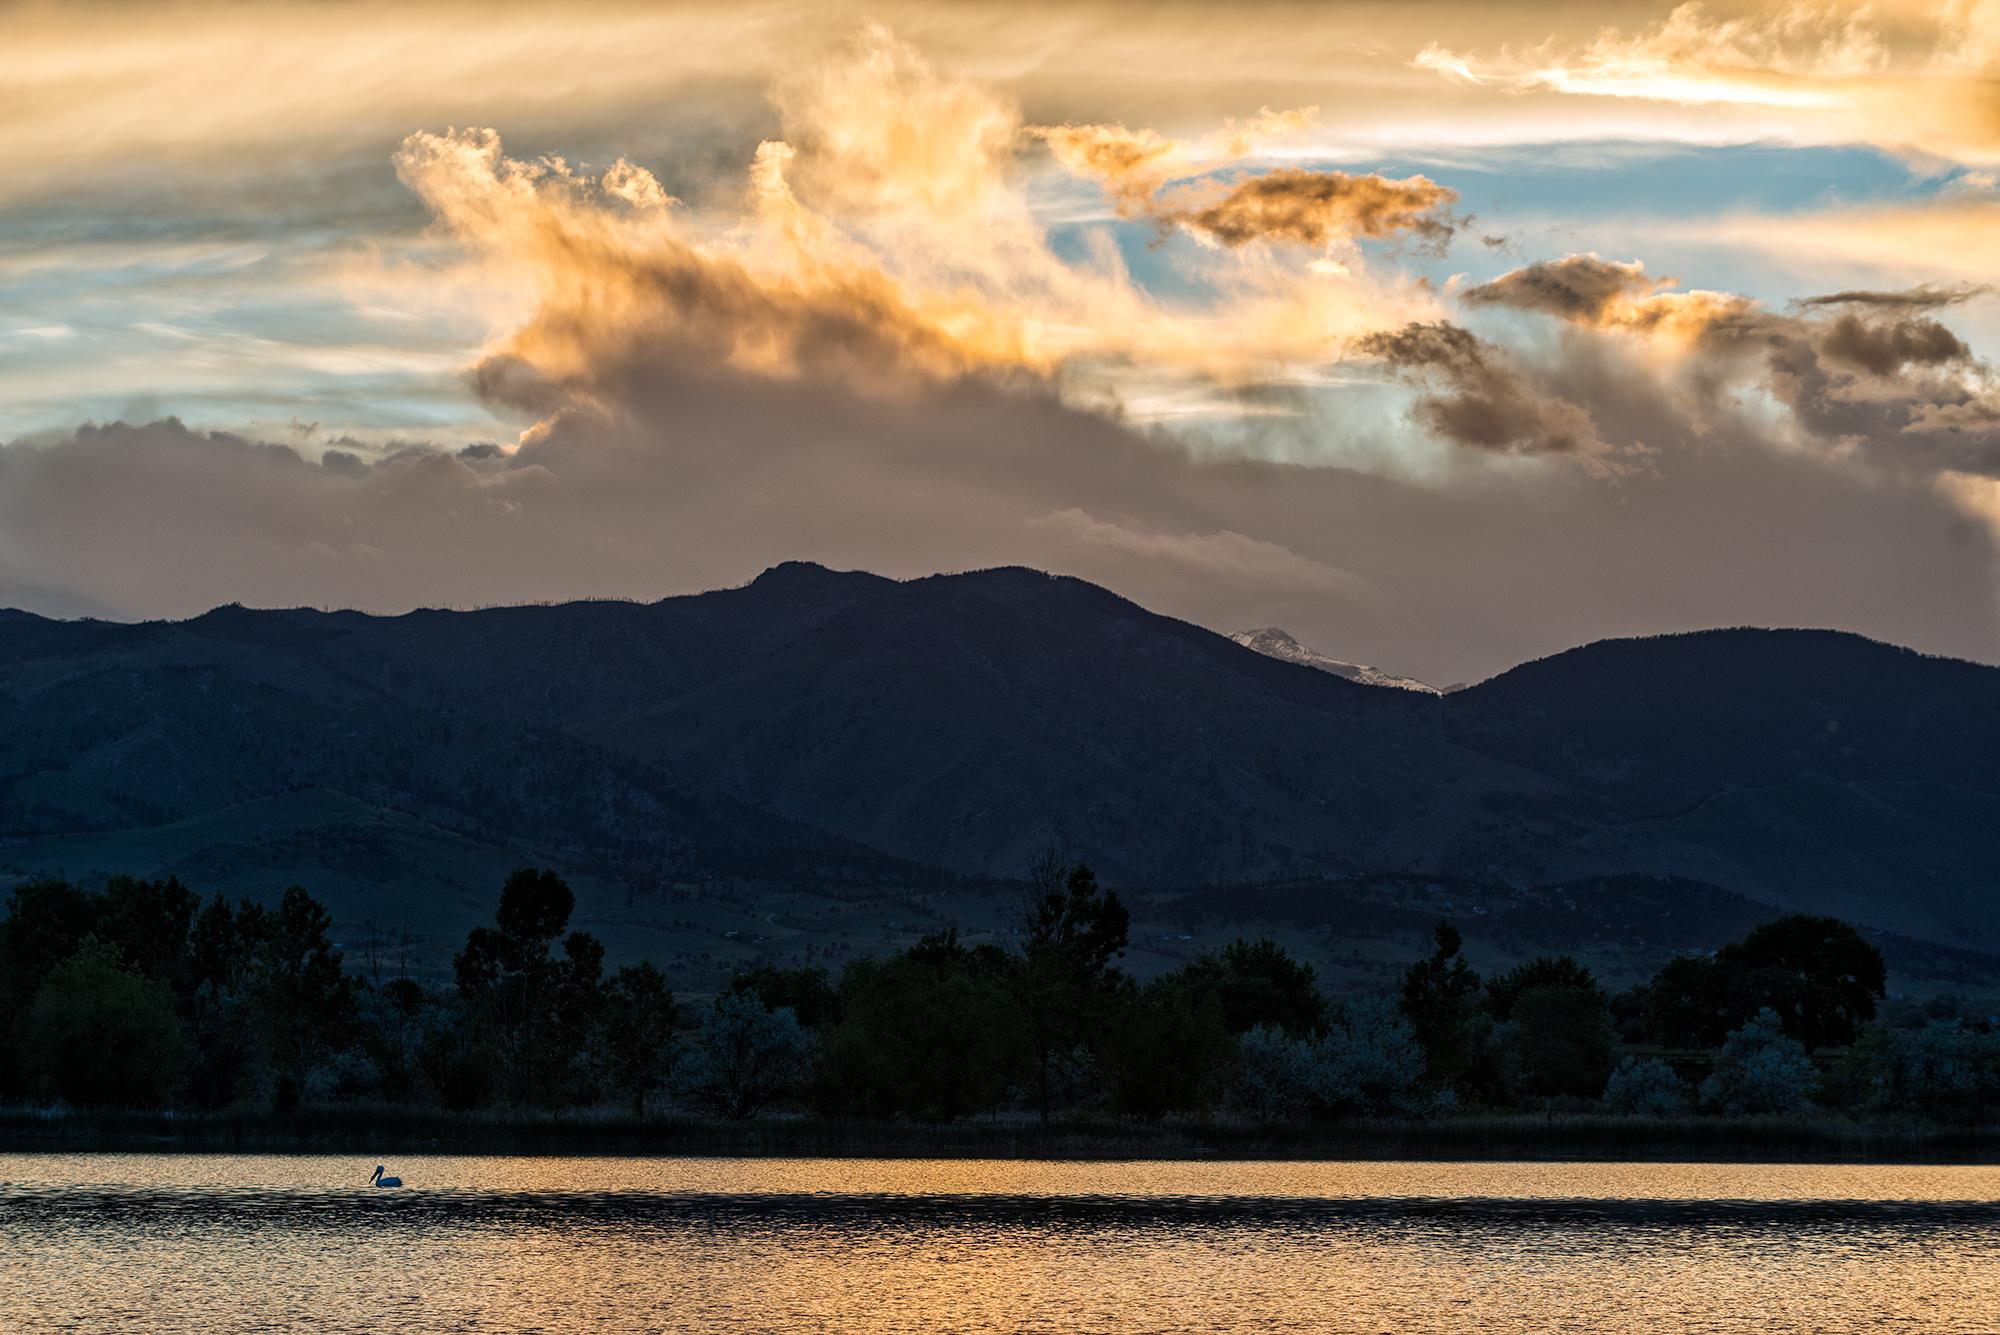 Crane on Coot Lake. Boulder County, Colorado, 2016